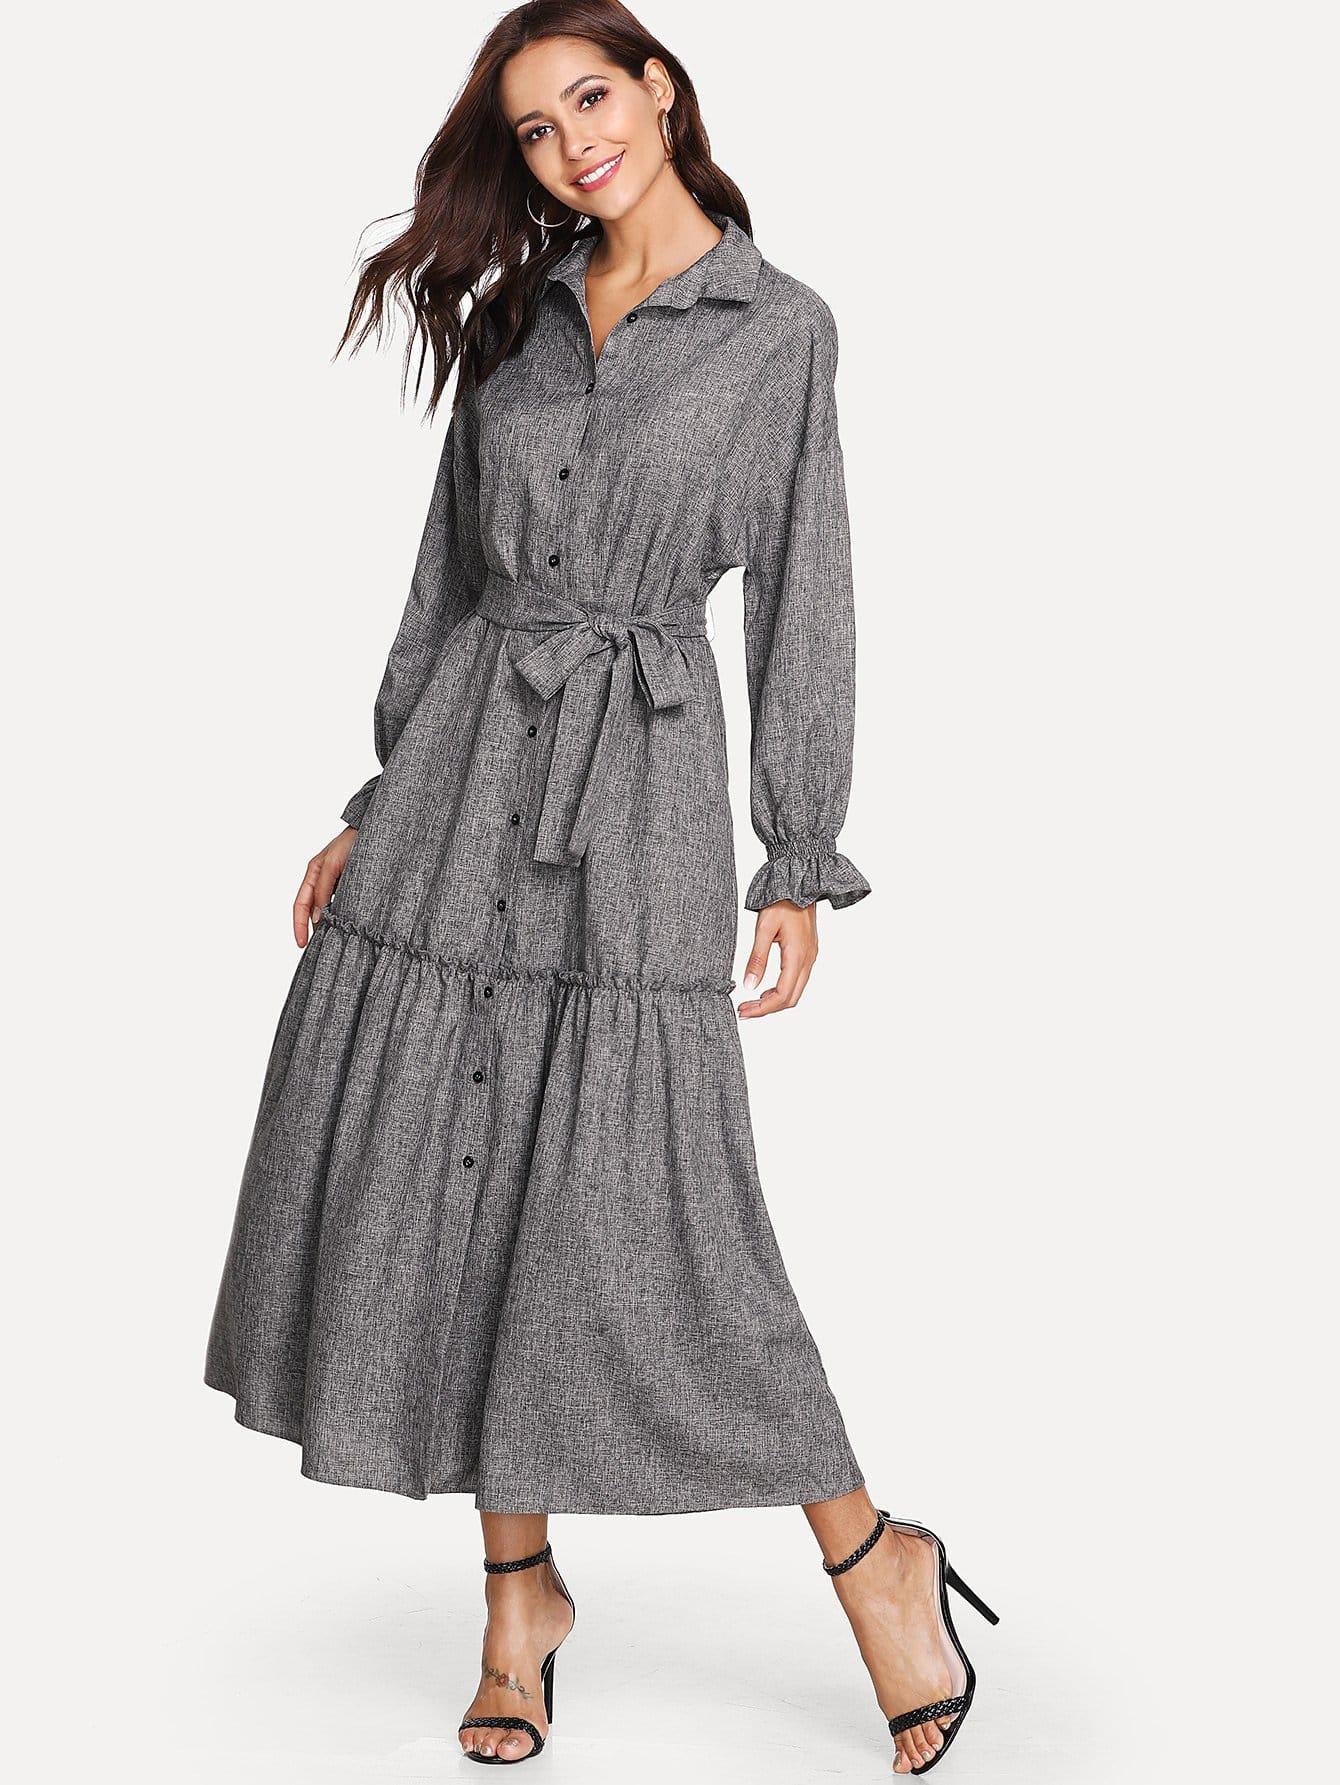 Flounce Sleeve Tie Waist Pocket Side Shirt Dress batwing sleeve pocket side curved hem textured dress